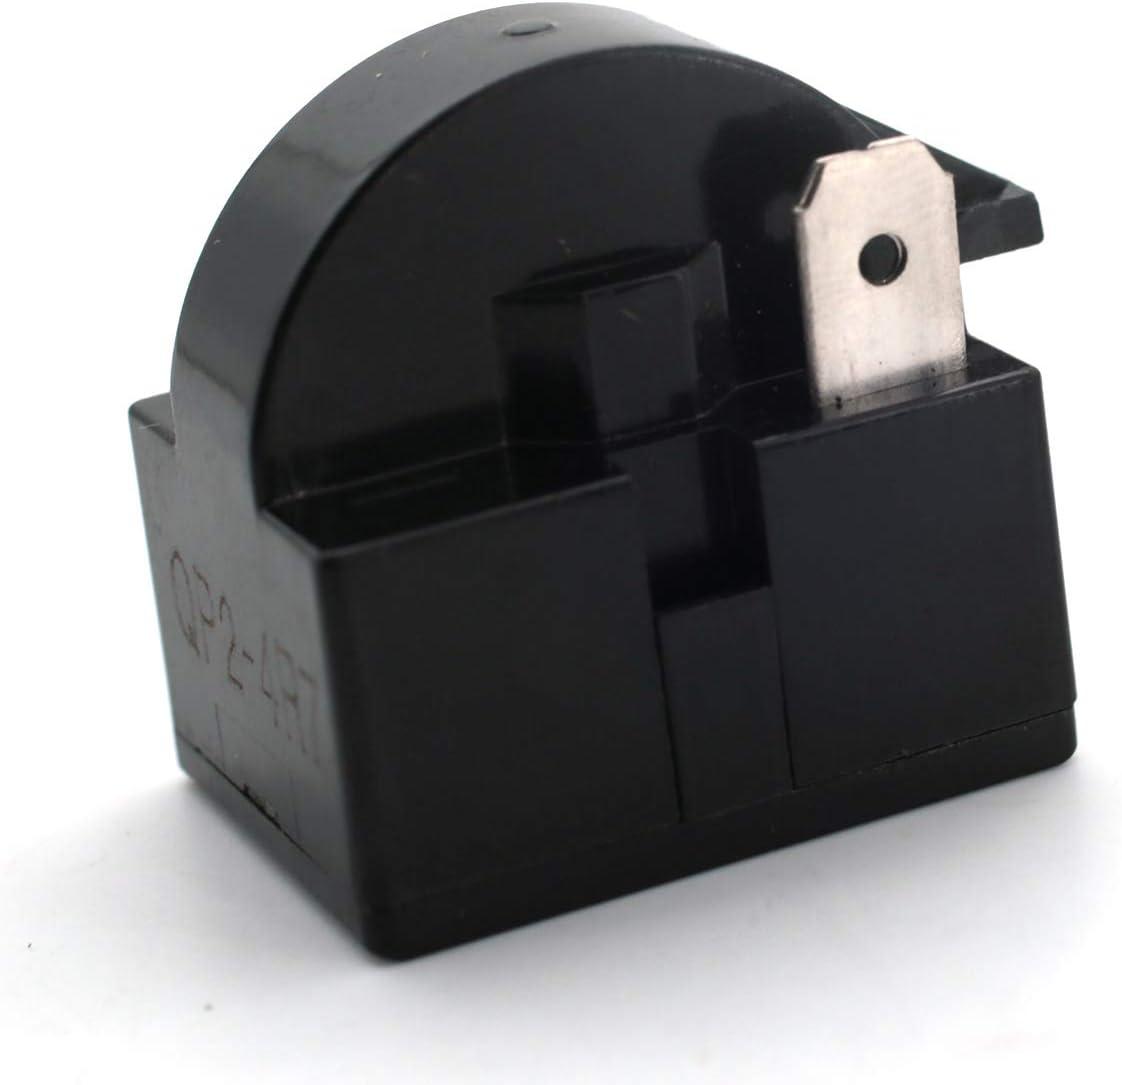 CENTAURUS Universal QP2-4.7 Start Relay Refrigerator PTC Compressor 4.7 Ohm 1 Pin Wine Centers Beverage Coolers Compressor Starter for Vissani Danby Compressor